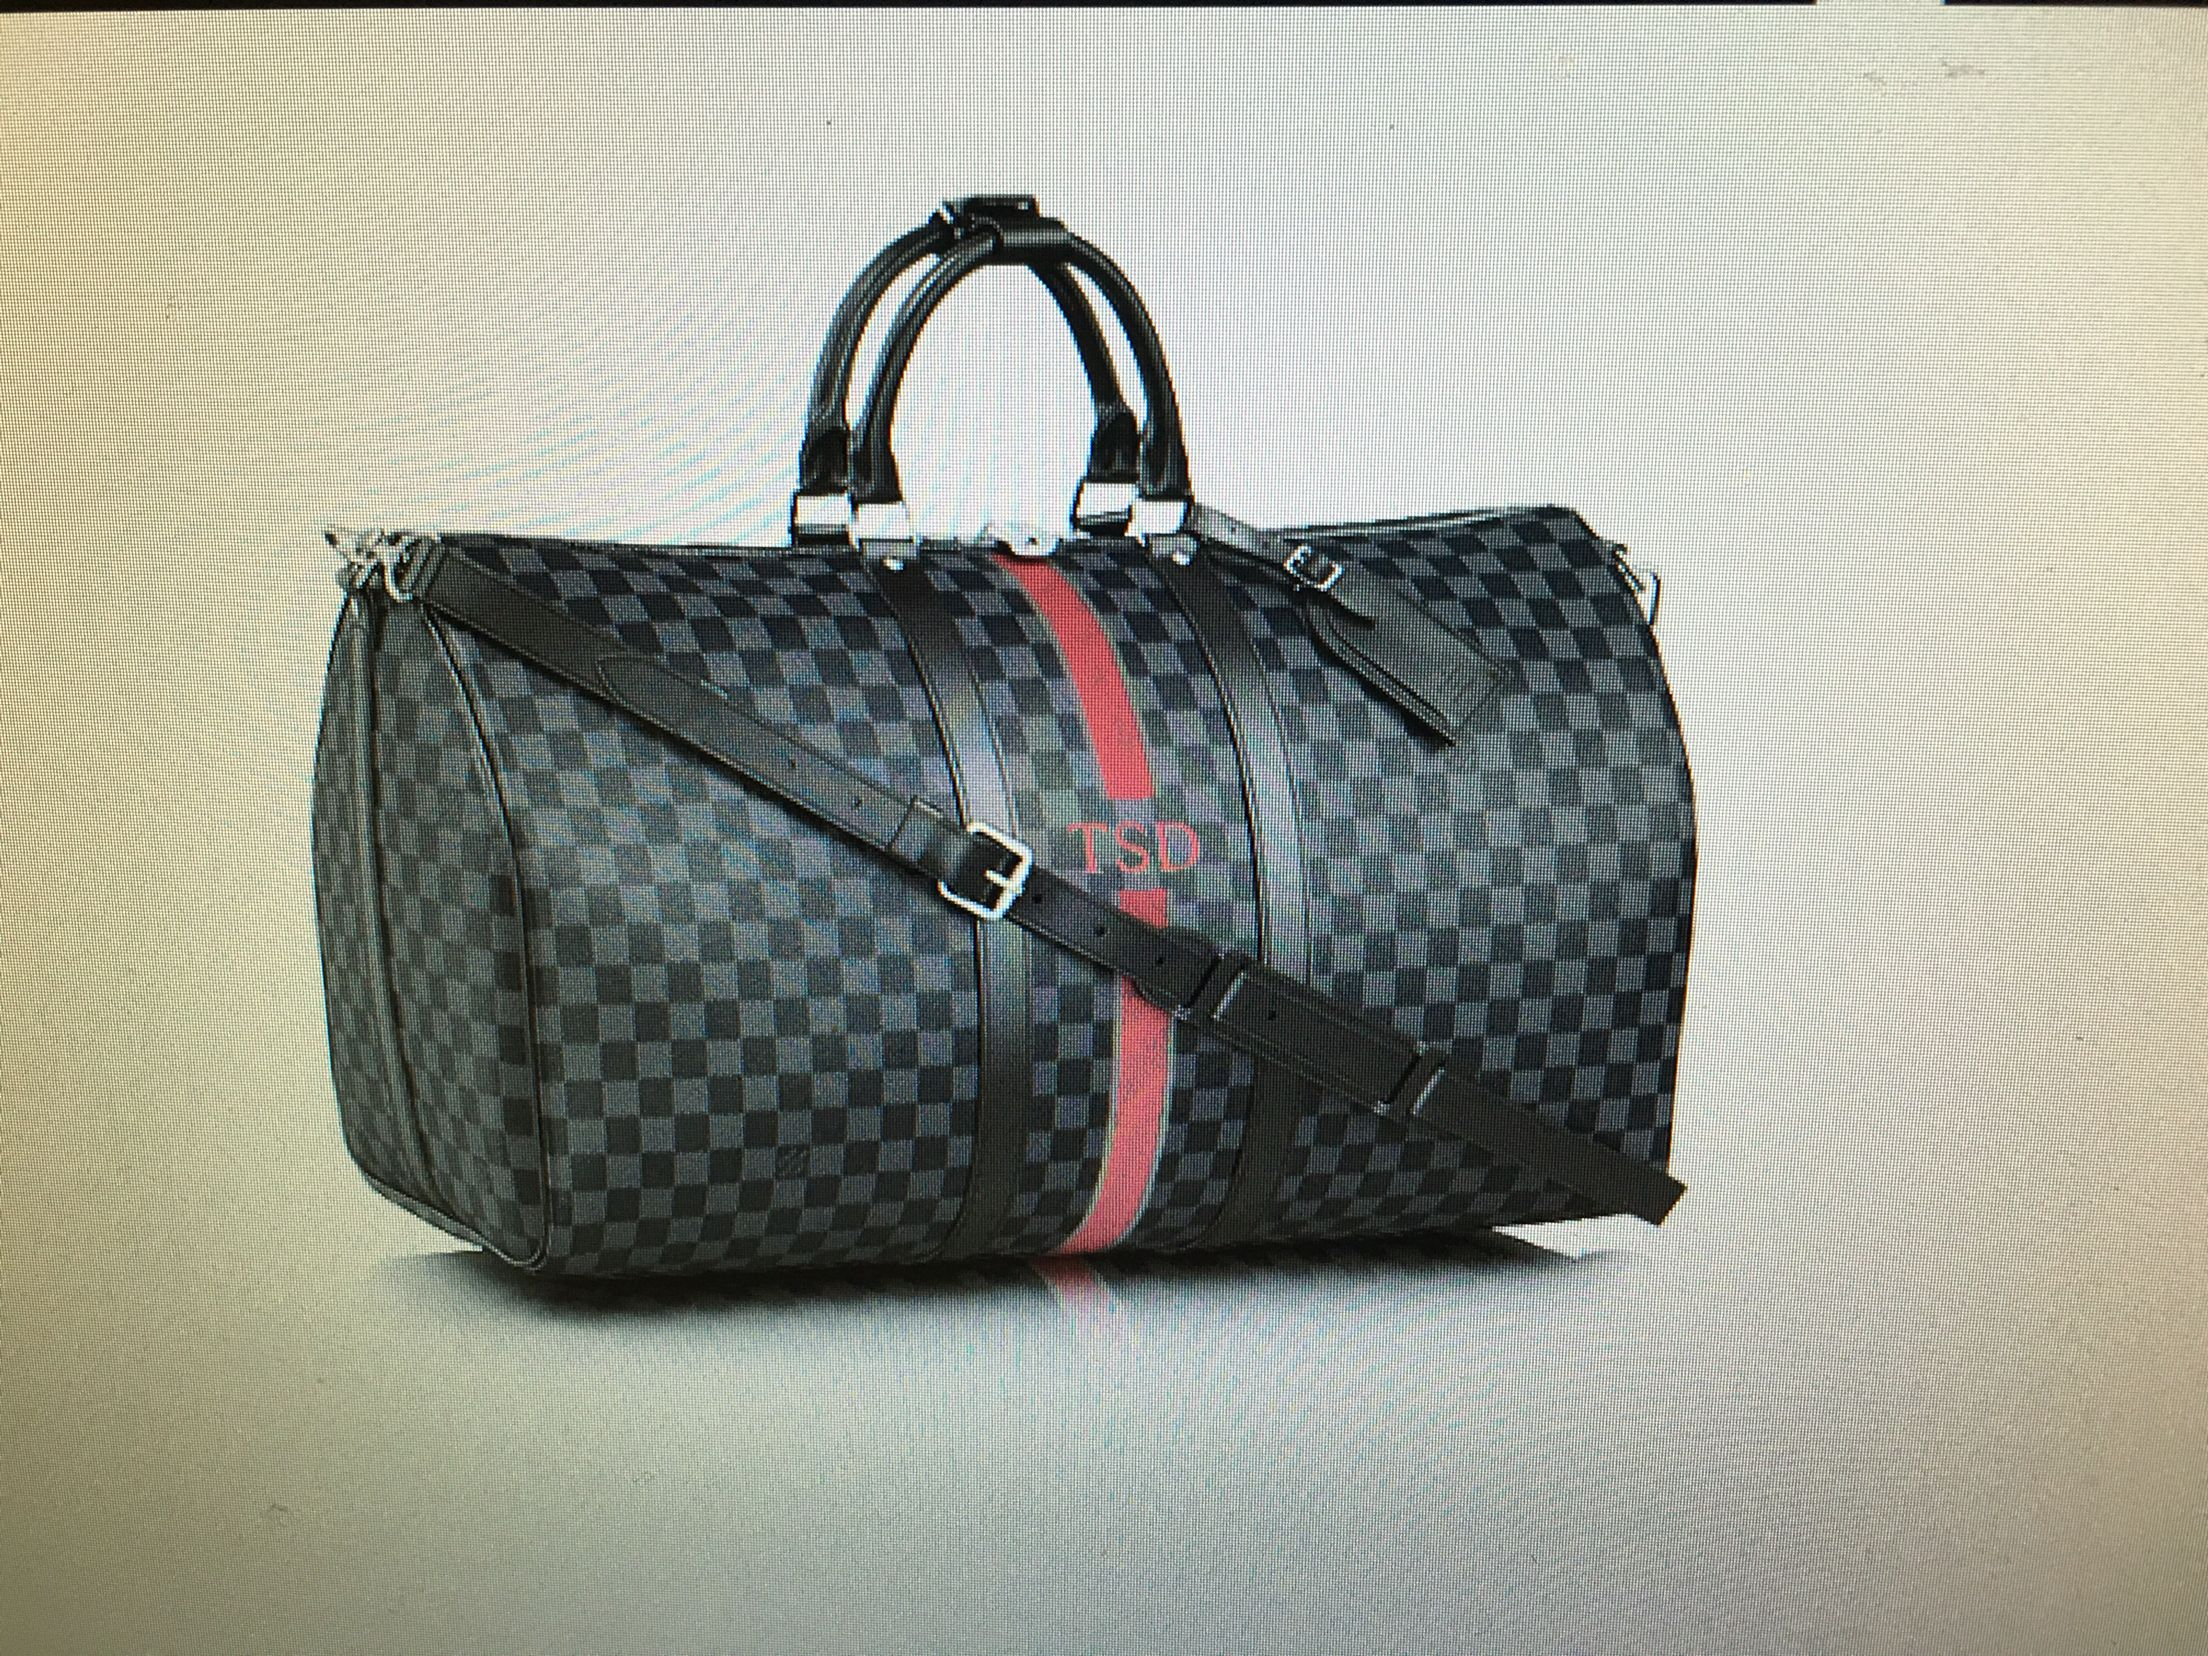 289ff10220eb Louis Vuitton Keepall Bandouliere 55